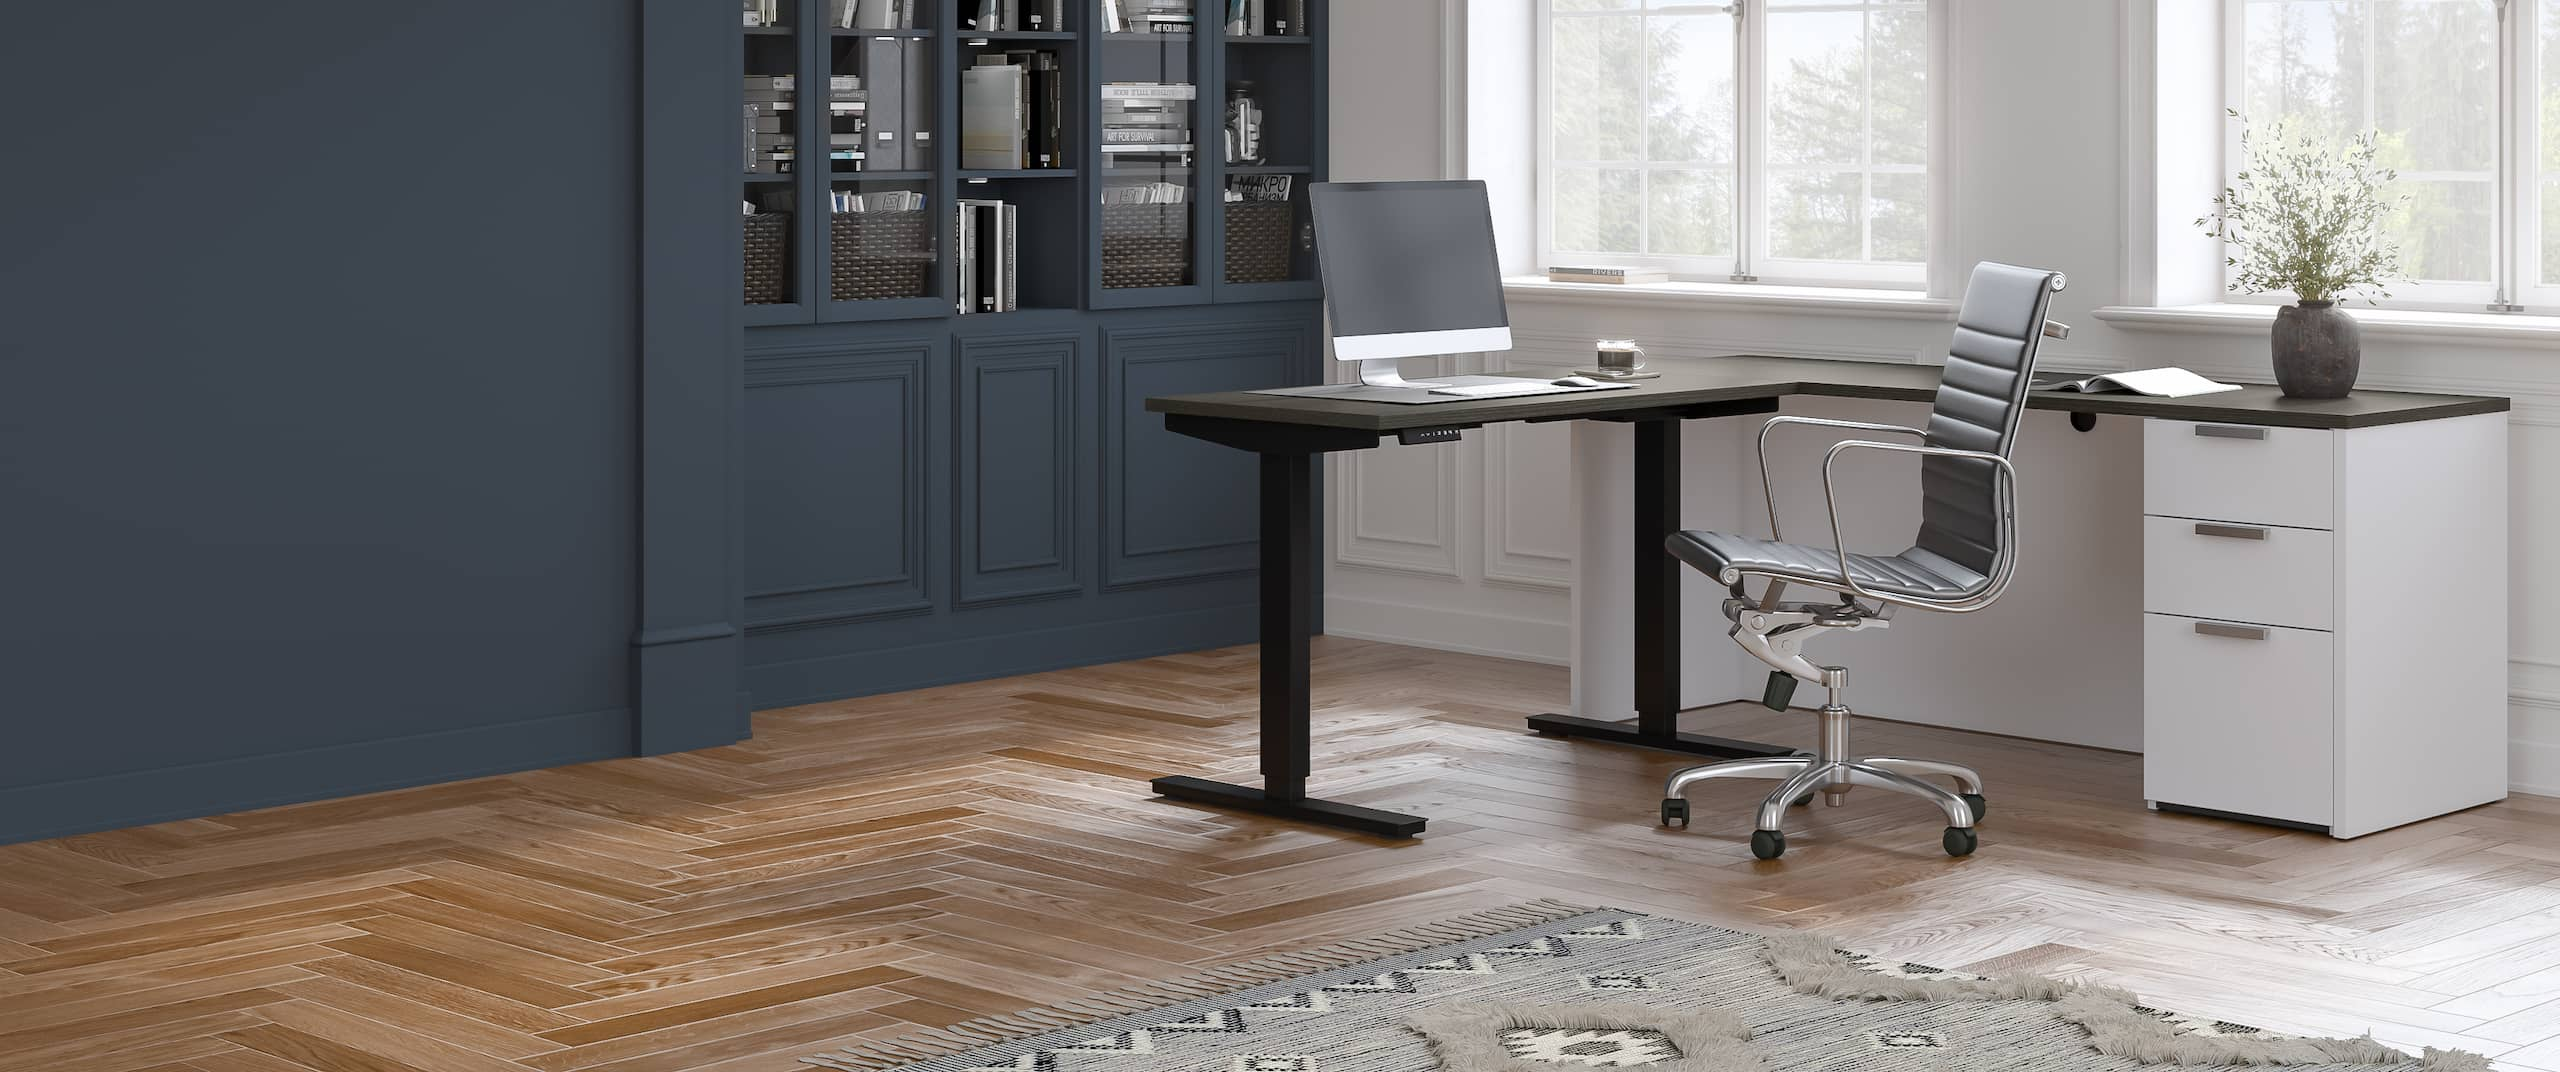 L-Shaped Standing Desk with Pedestal